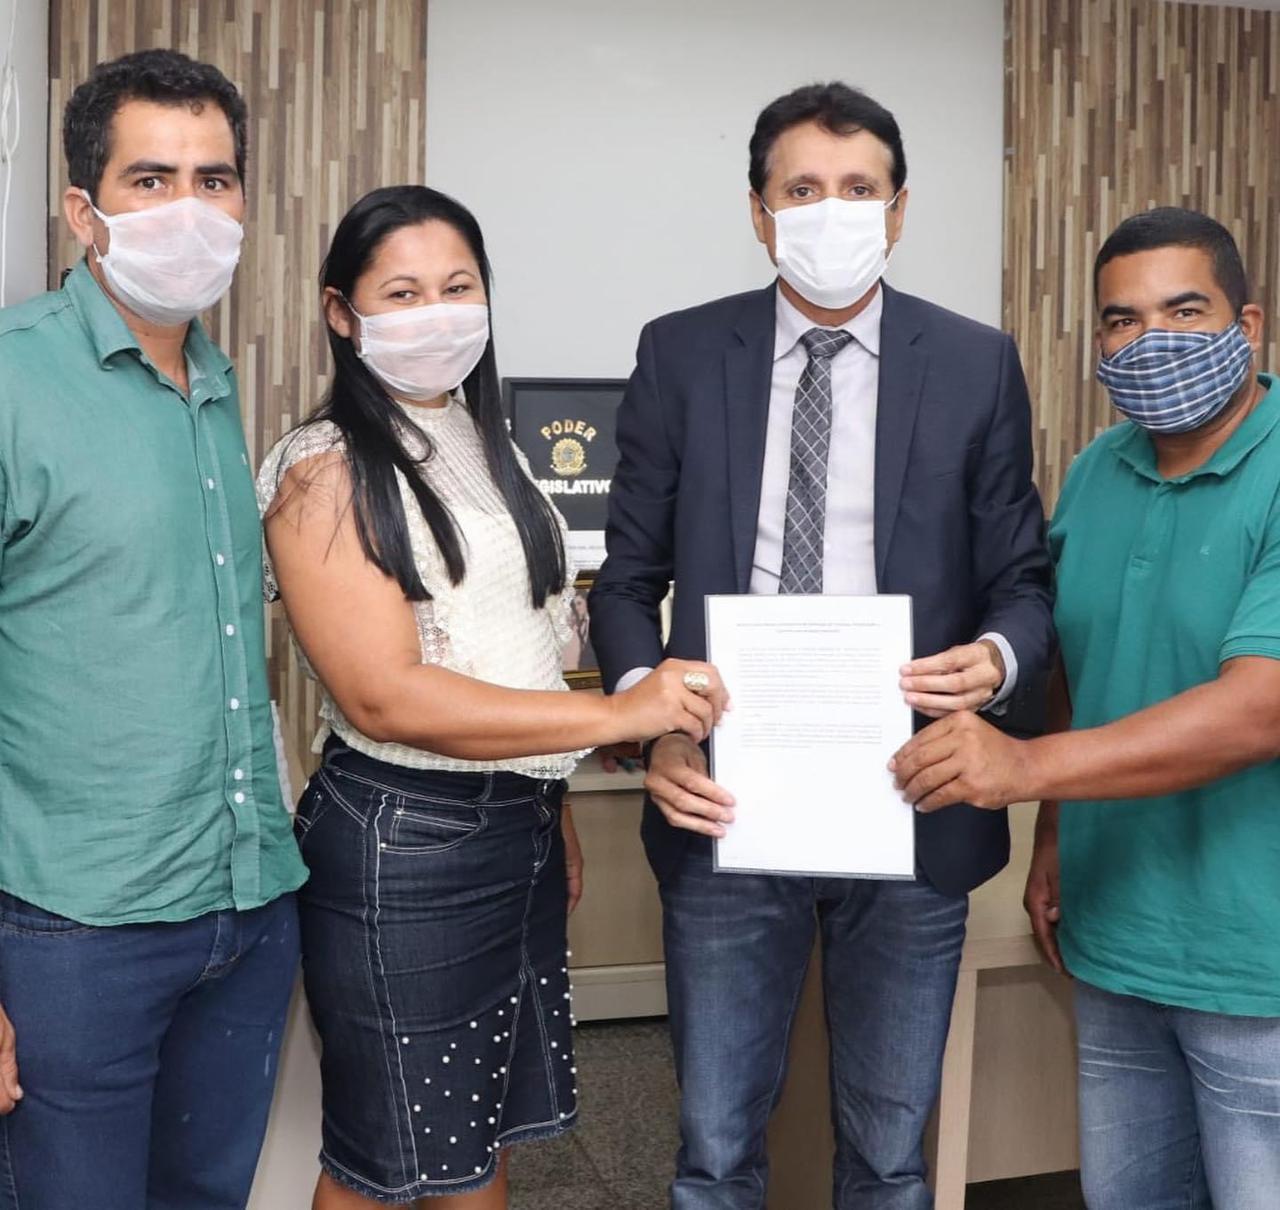 Deputado estadual Nilton Franco atende vereadores de Jaú do Tocantins e recebe demandas do município